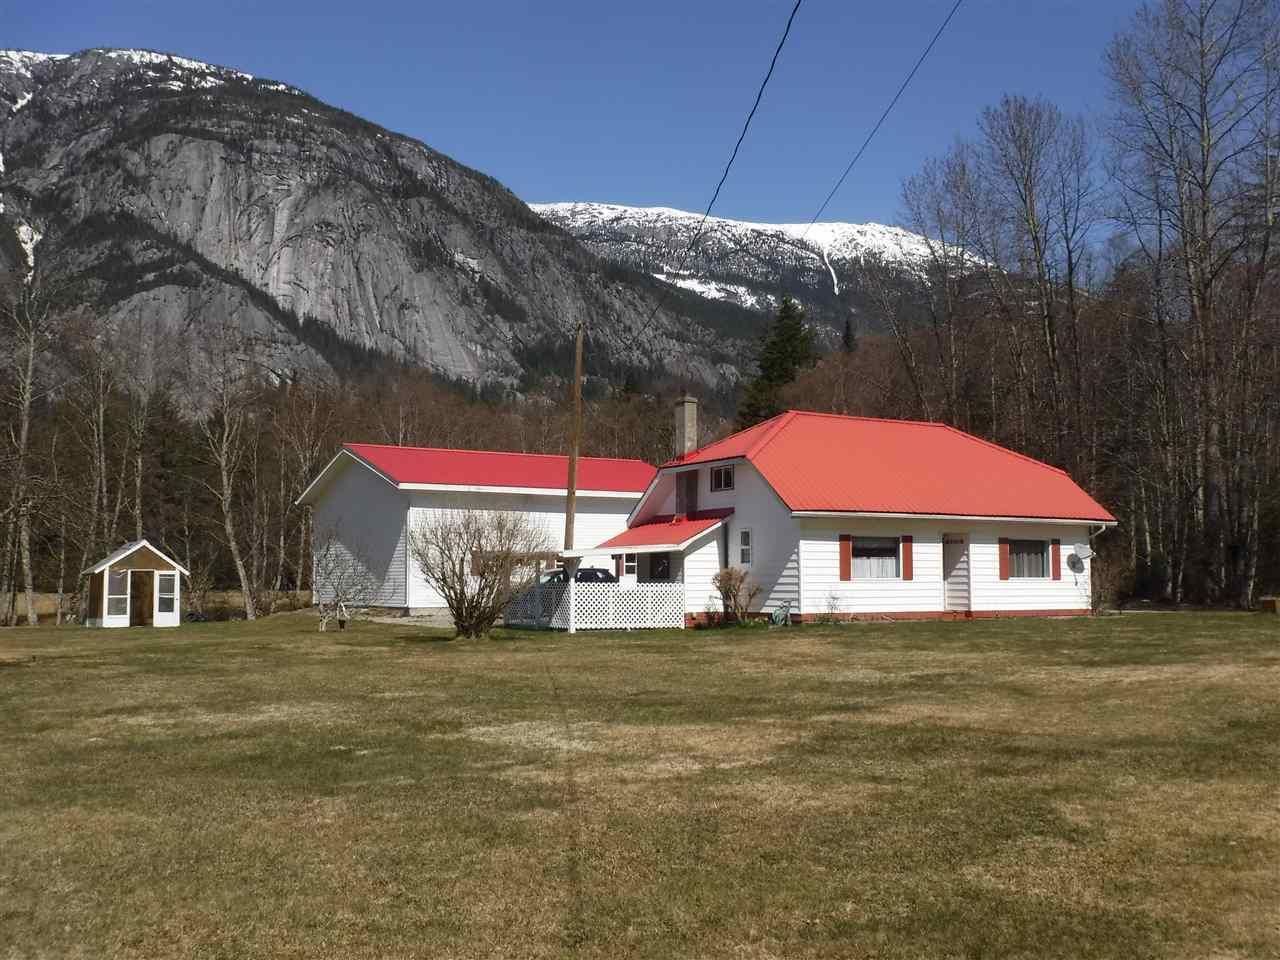 Main Photo: 1576 W MACKENZIE Highway in Bella Coola: Bella Coola/Hagensborg House for sale (Williams Lake (Zone 27))  : MLS®# R2450014